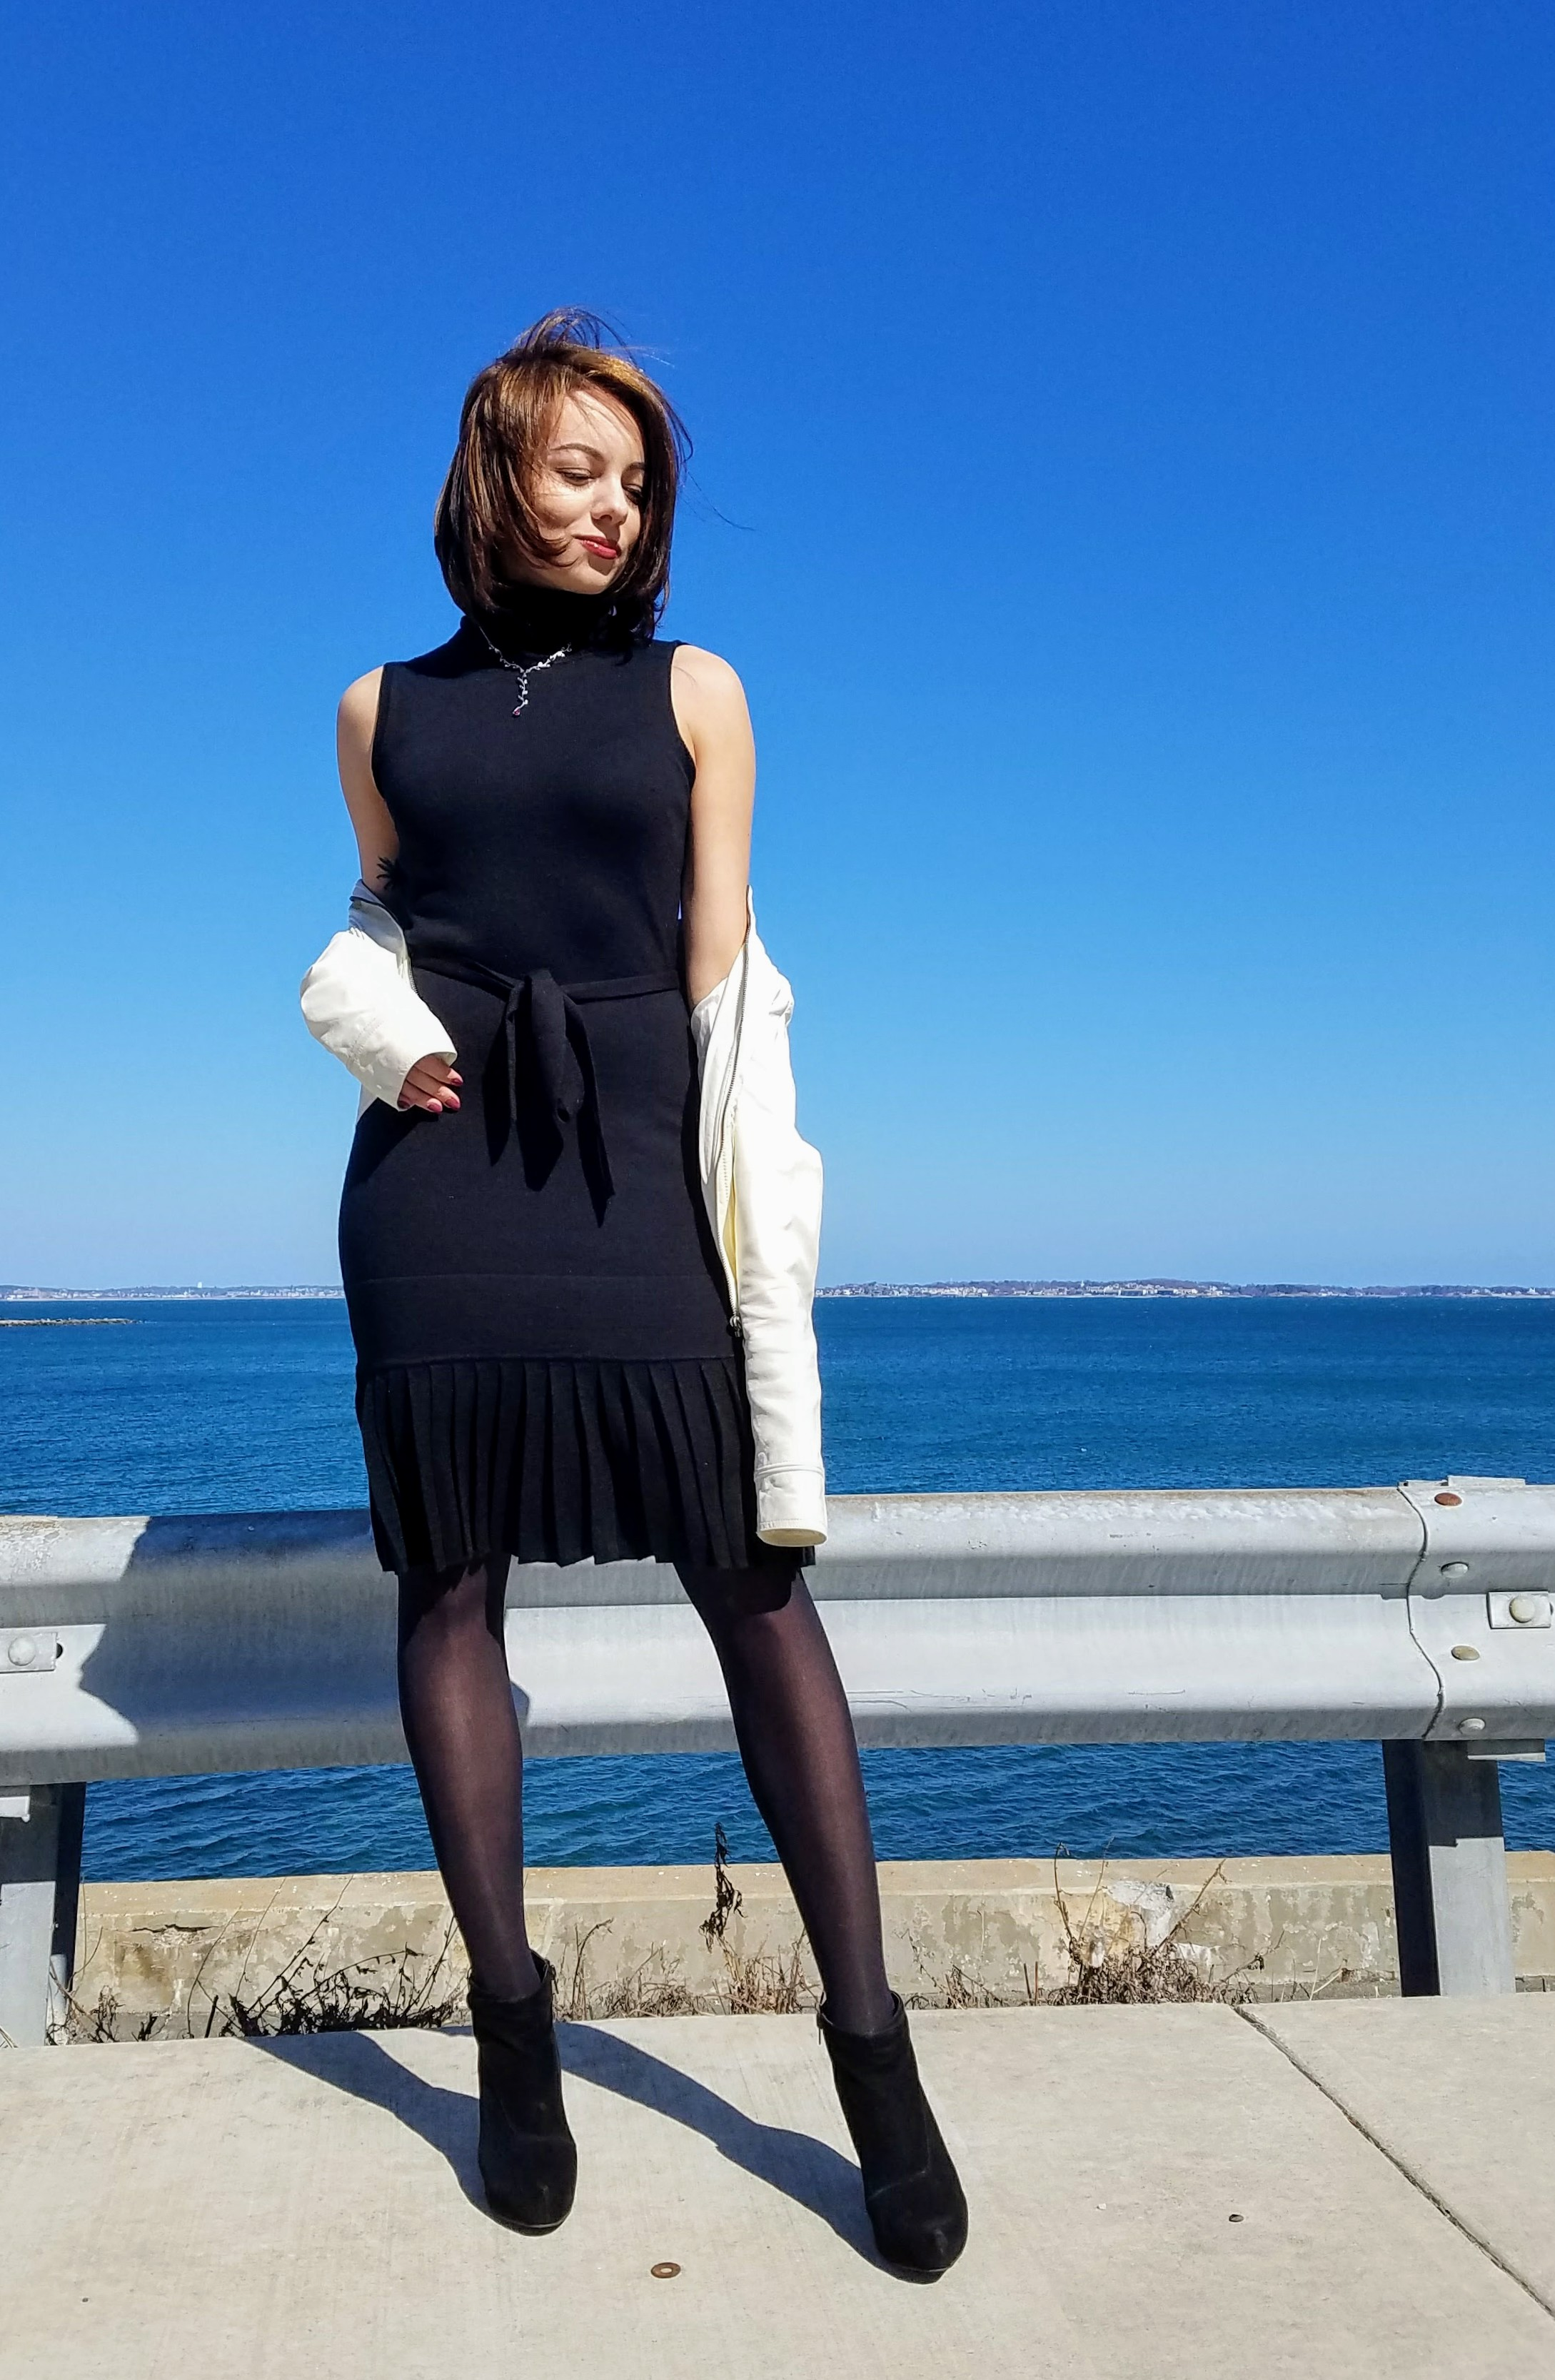 Black turtleneck dress, black ankle boots, white leather jacket.